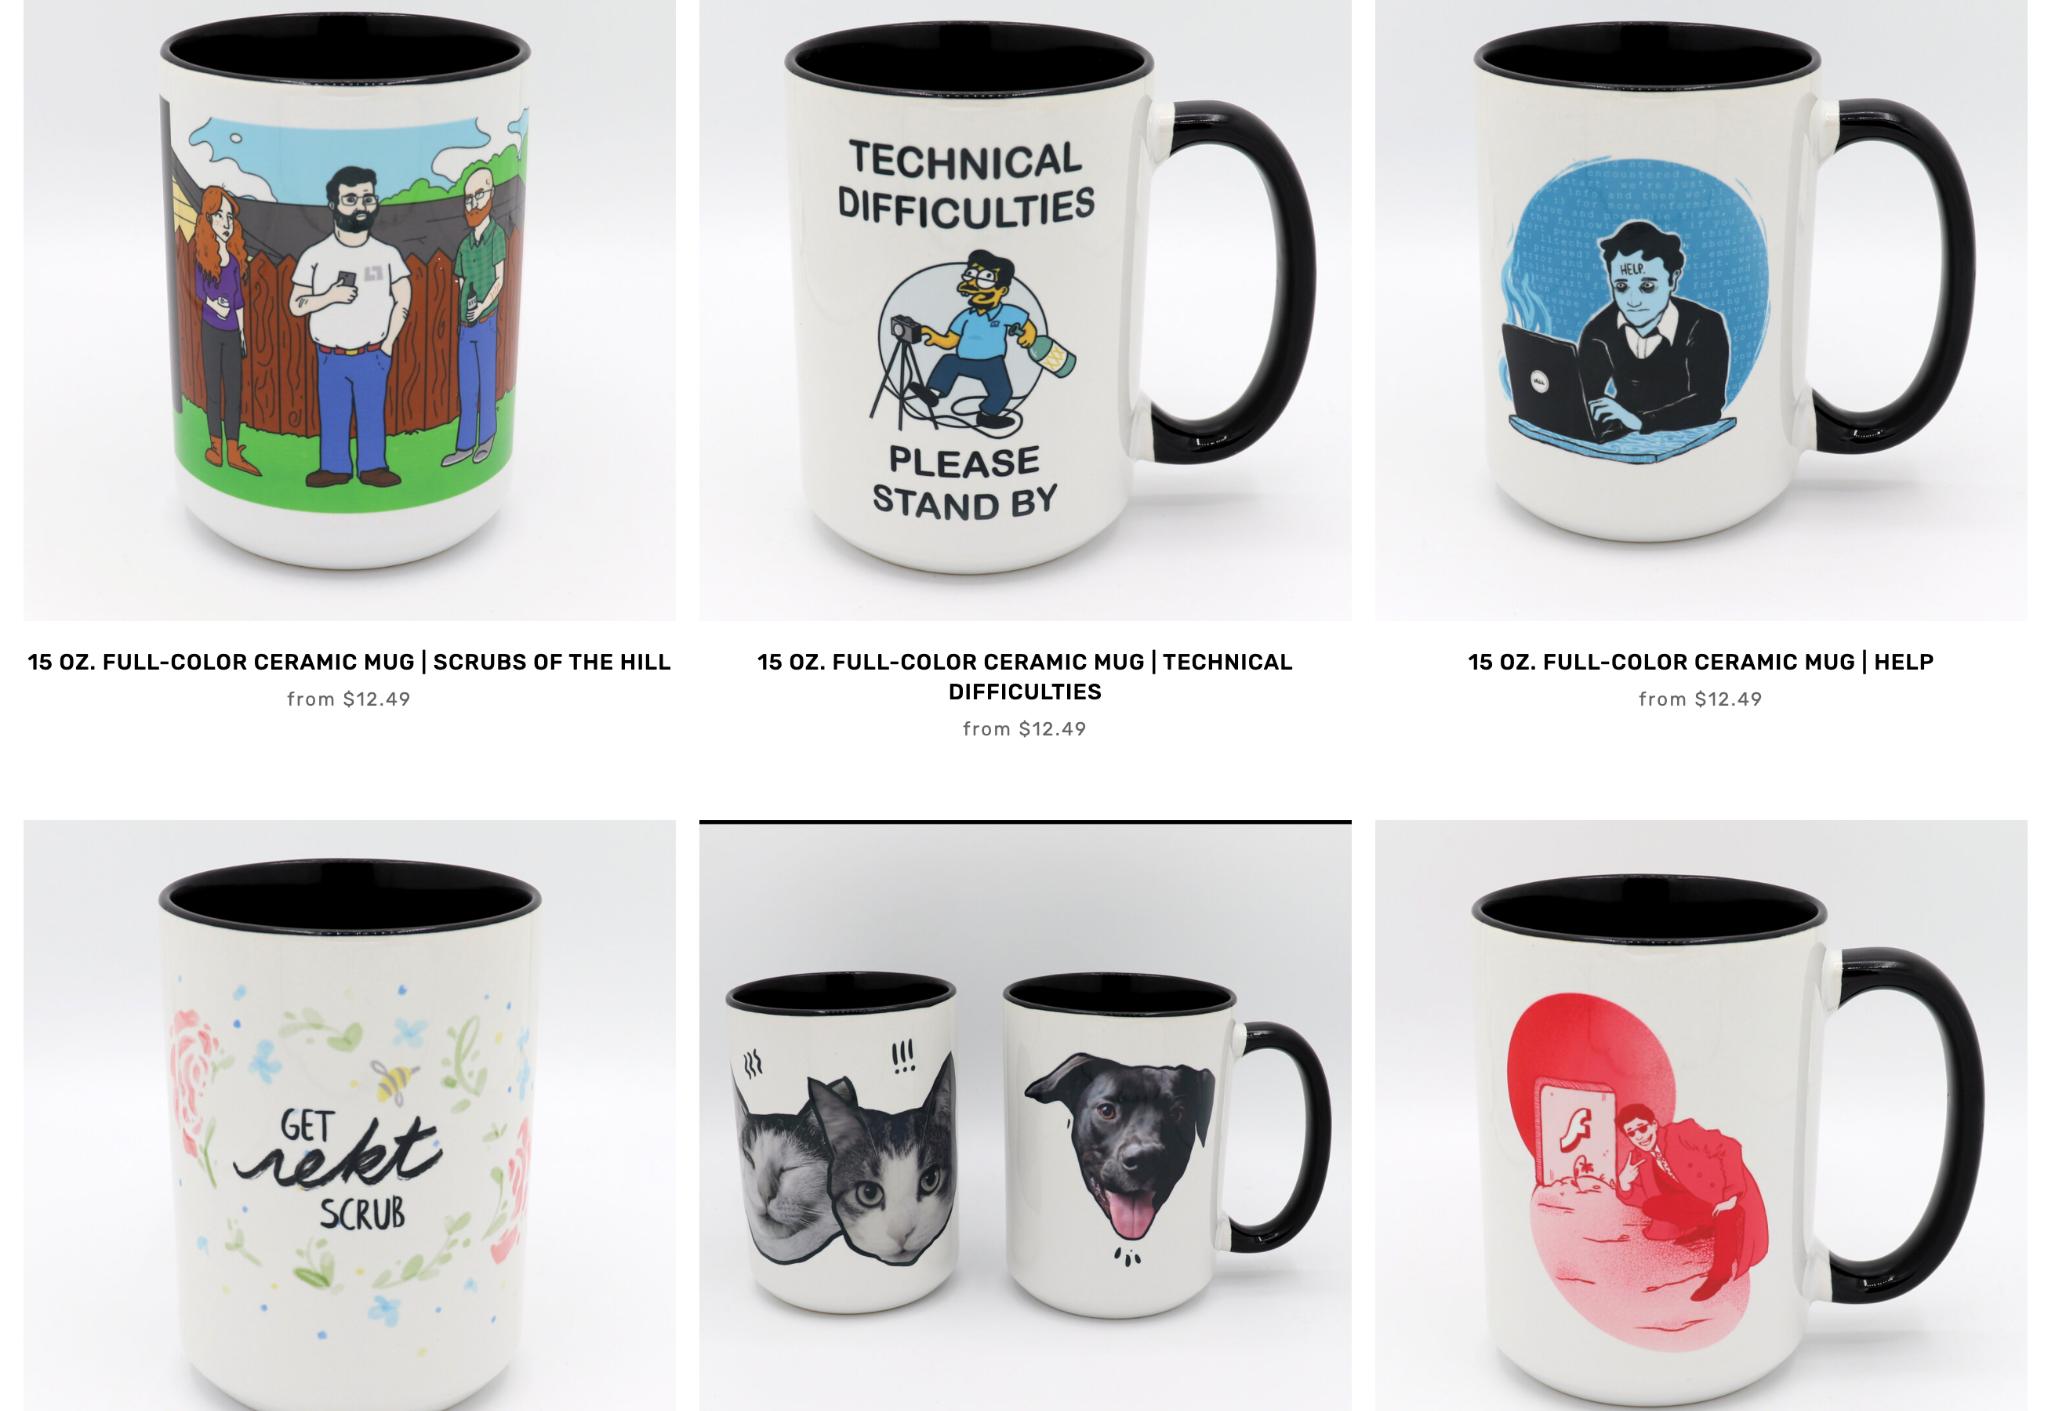 Level1Techs mugs and merchandise